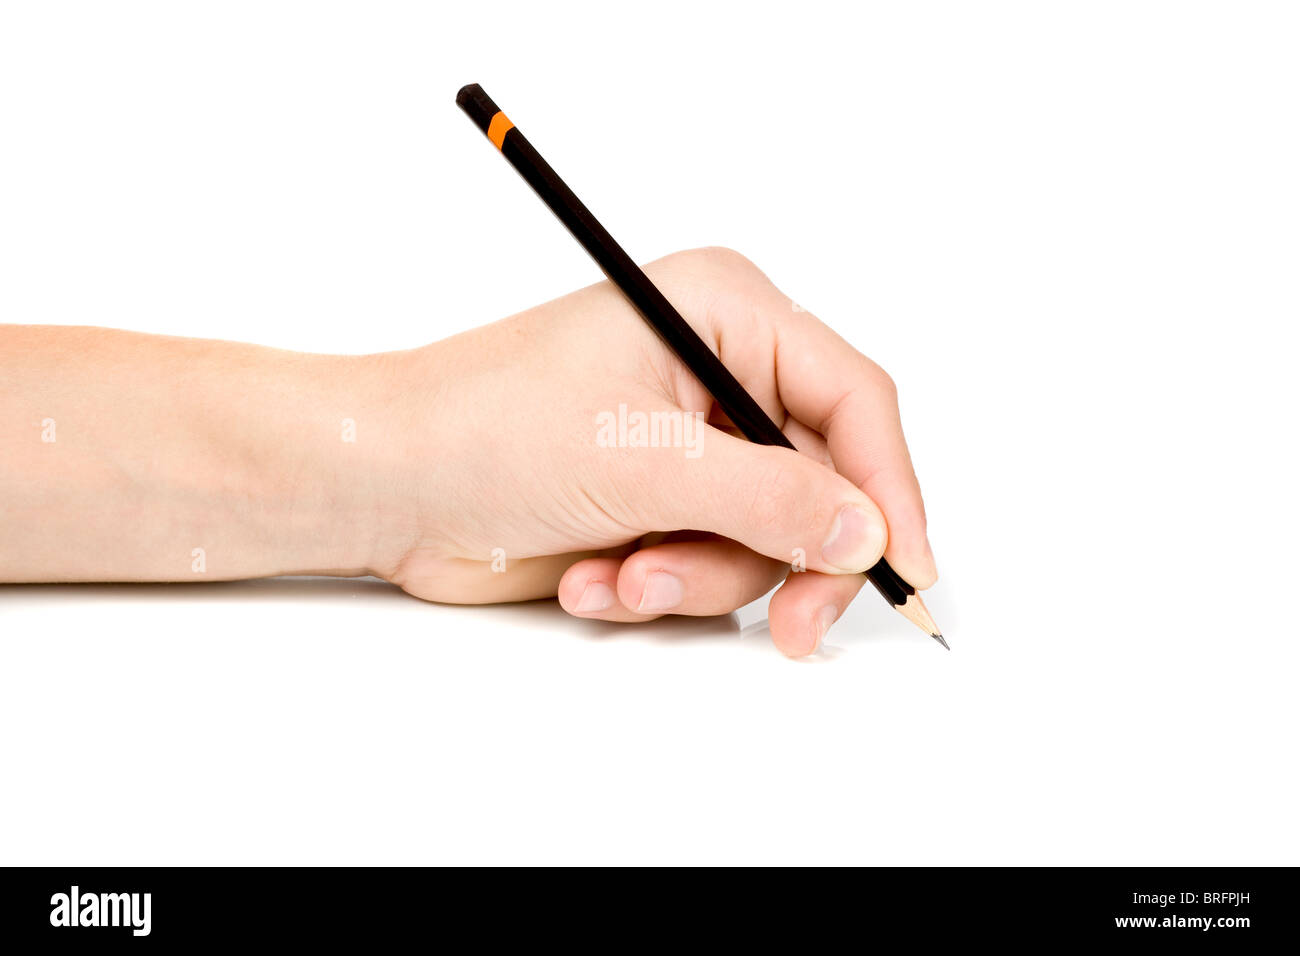 Left hand writing - Stock Image